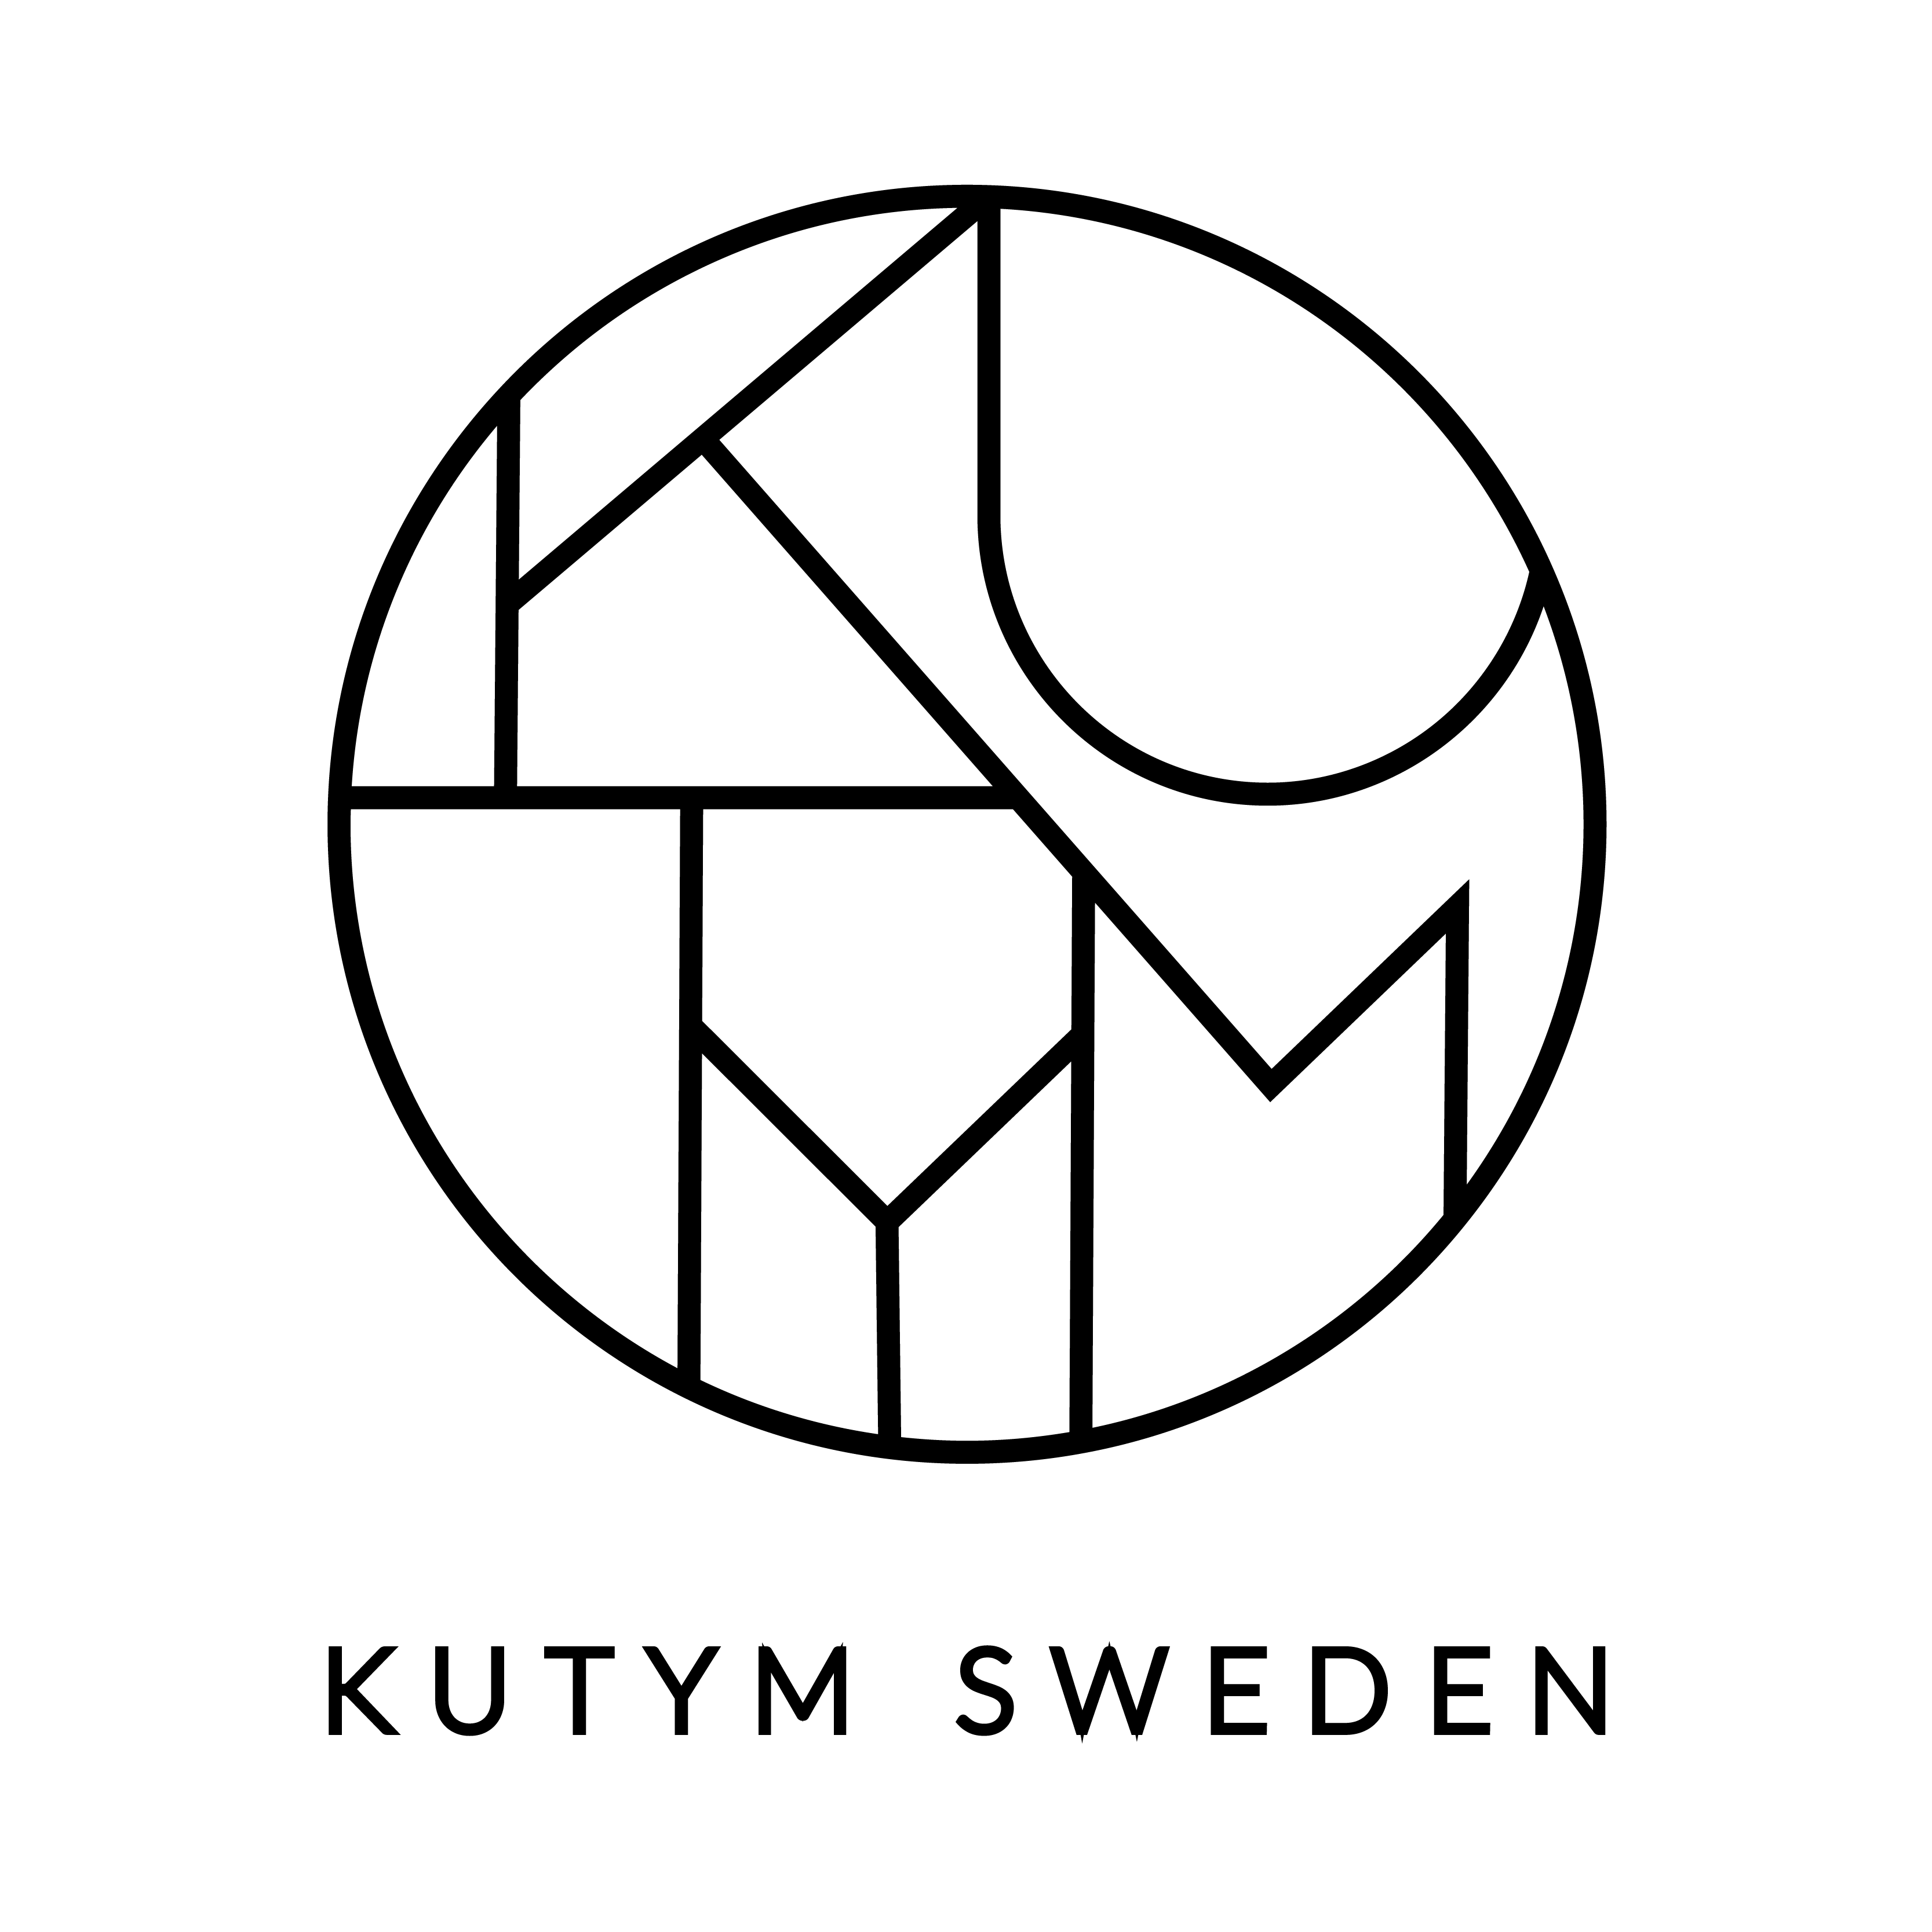 Kutym_logo_textundersymbol